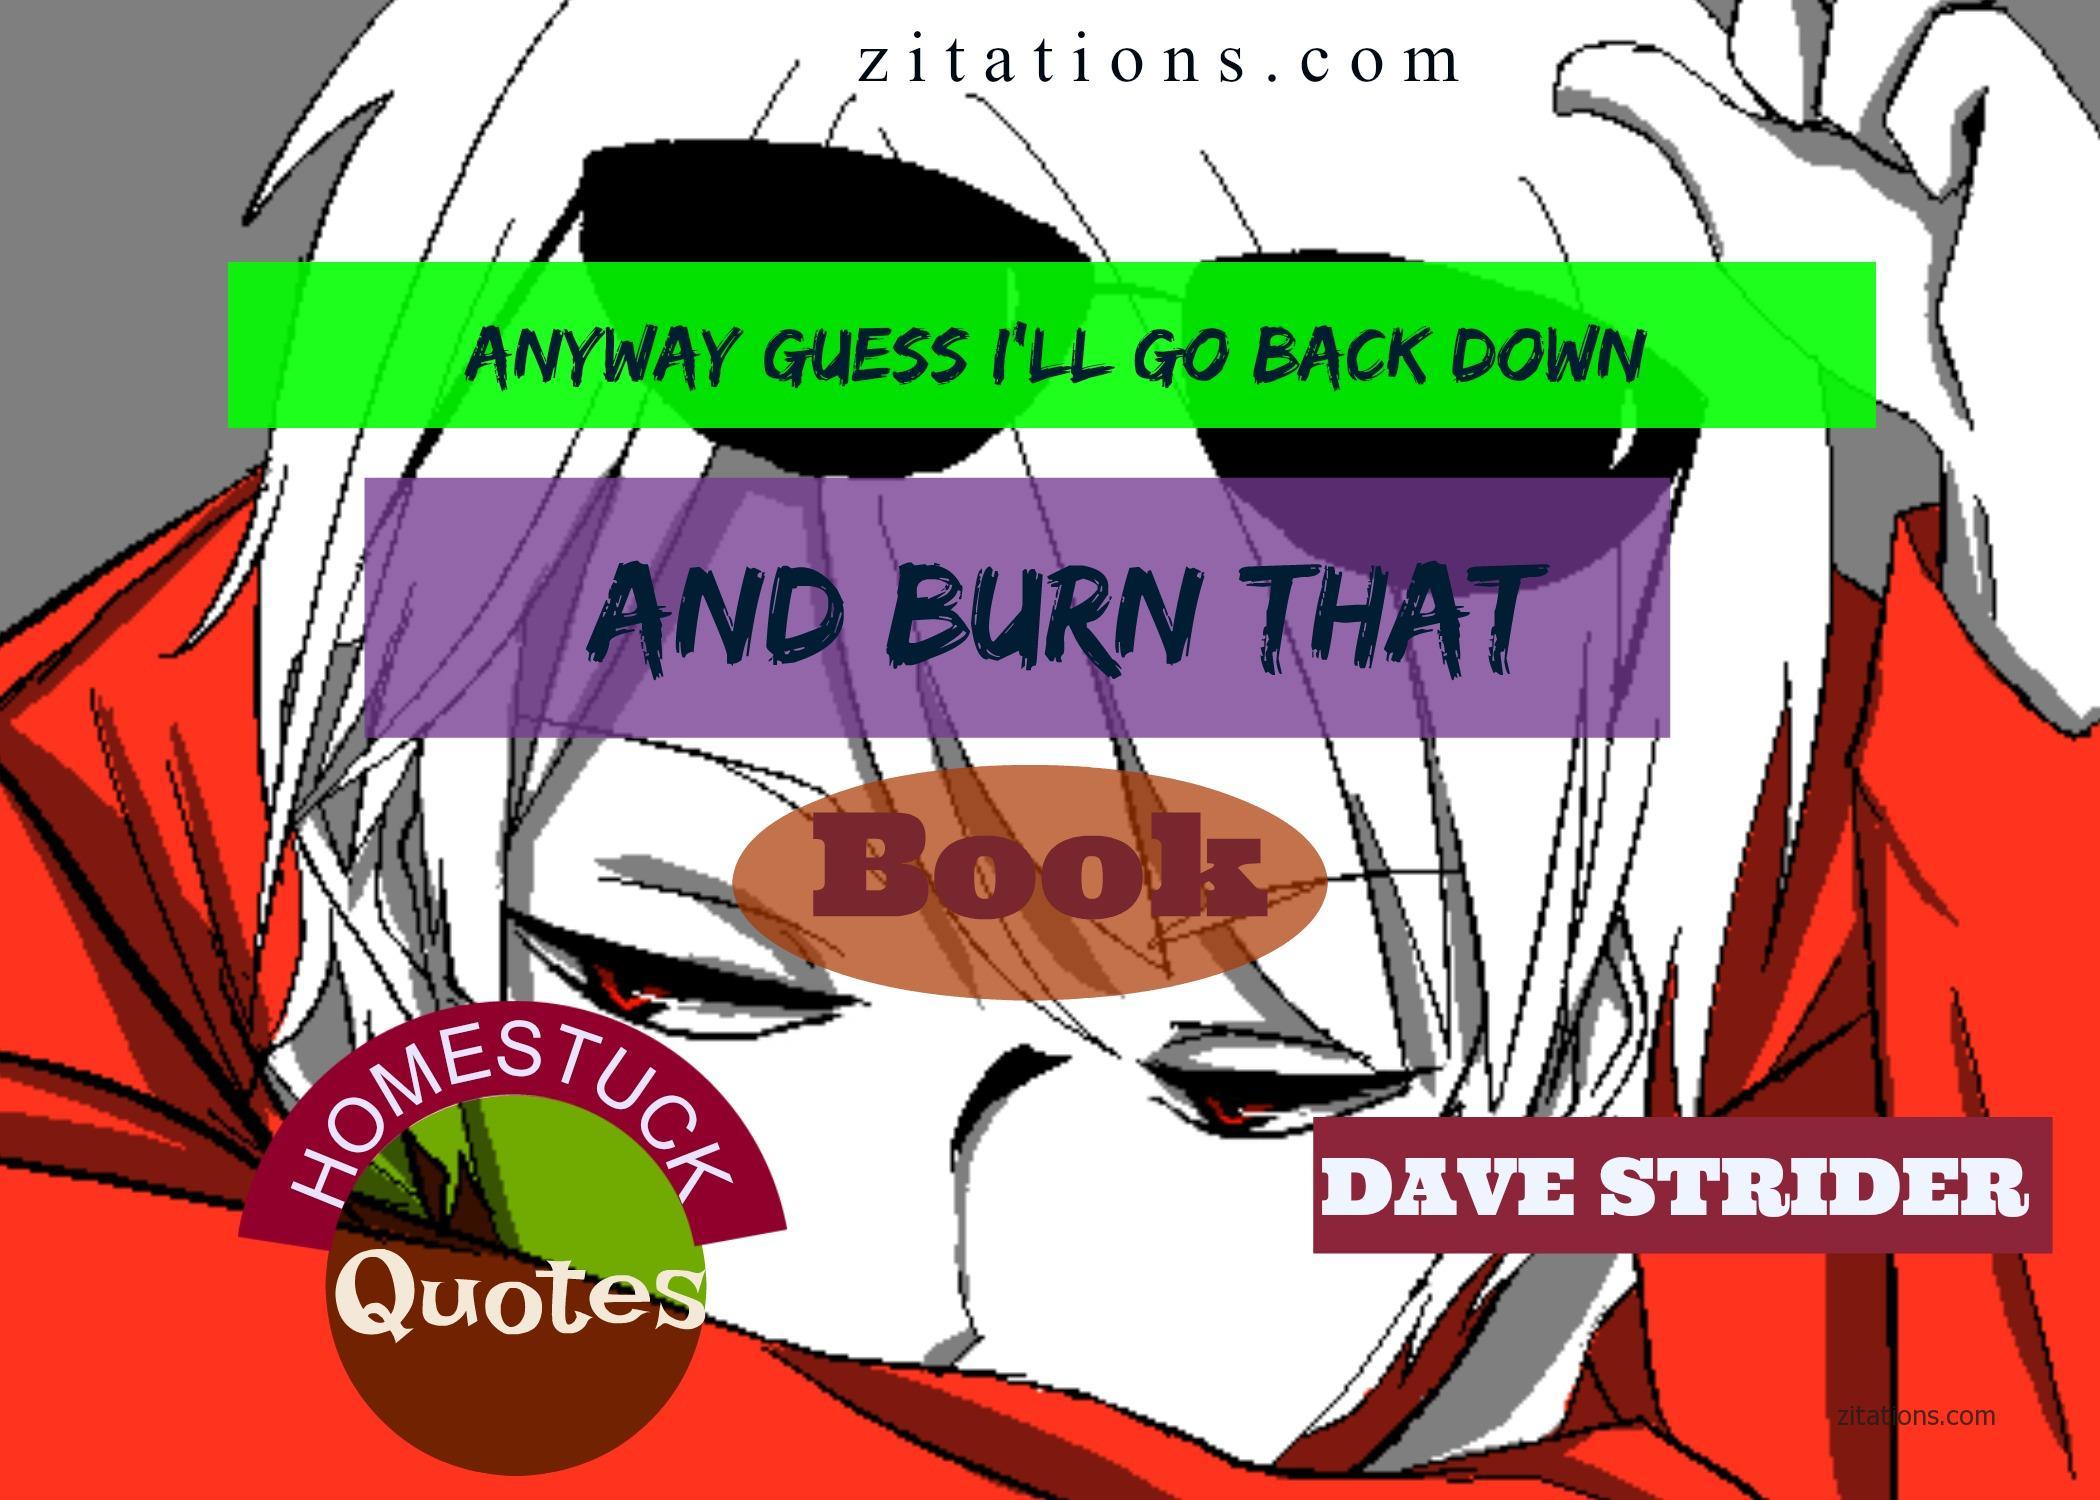 Dave Strider - Homestuck Quotes